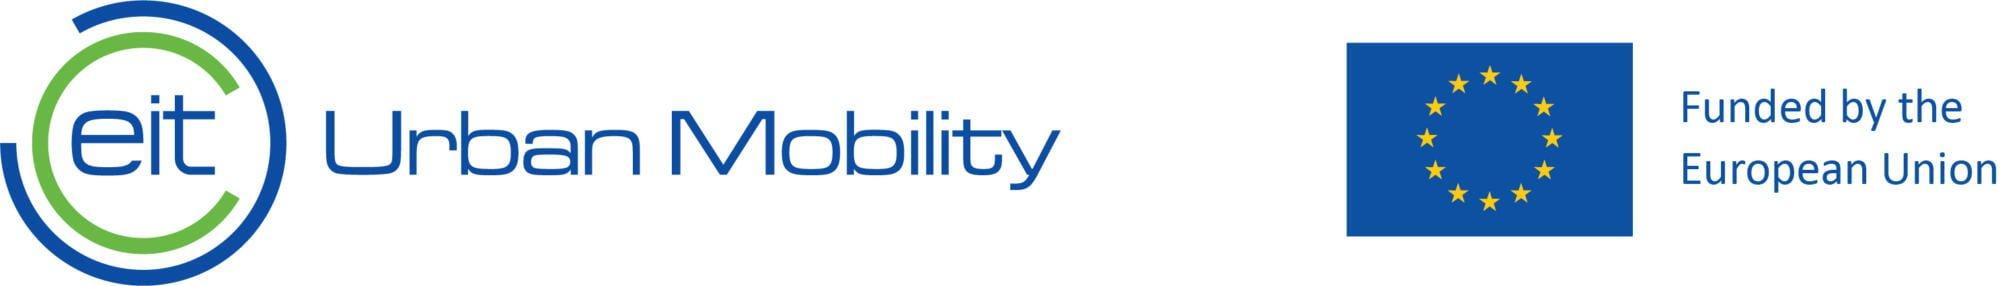 I. EIT Urban Mobility